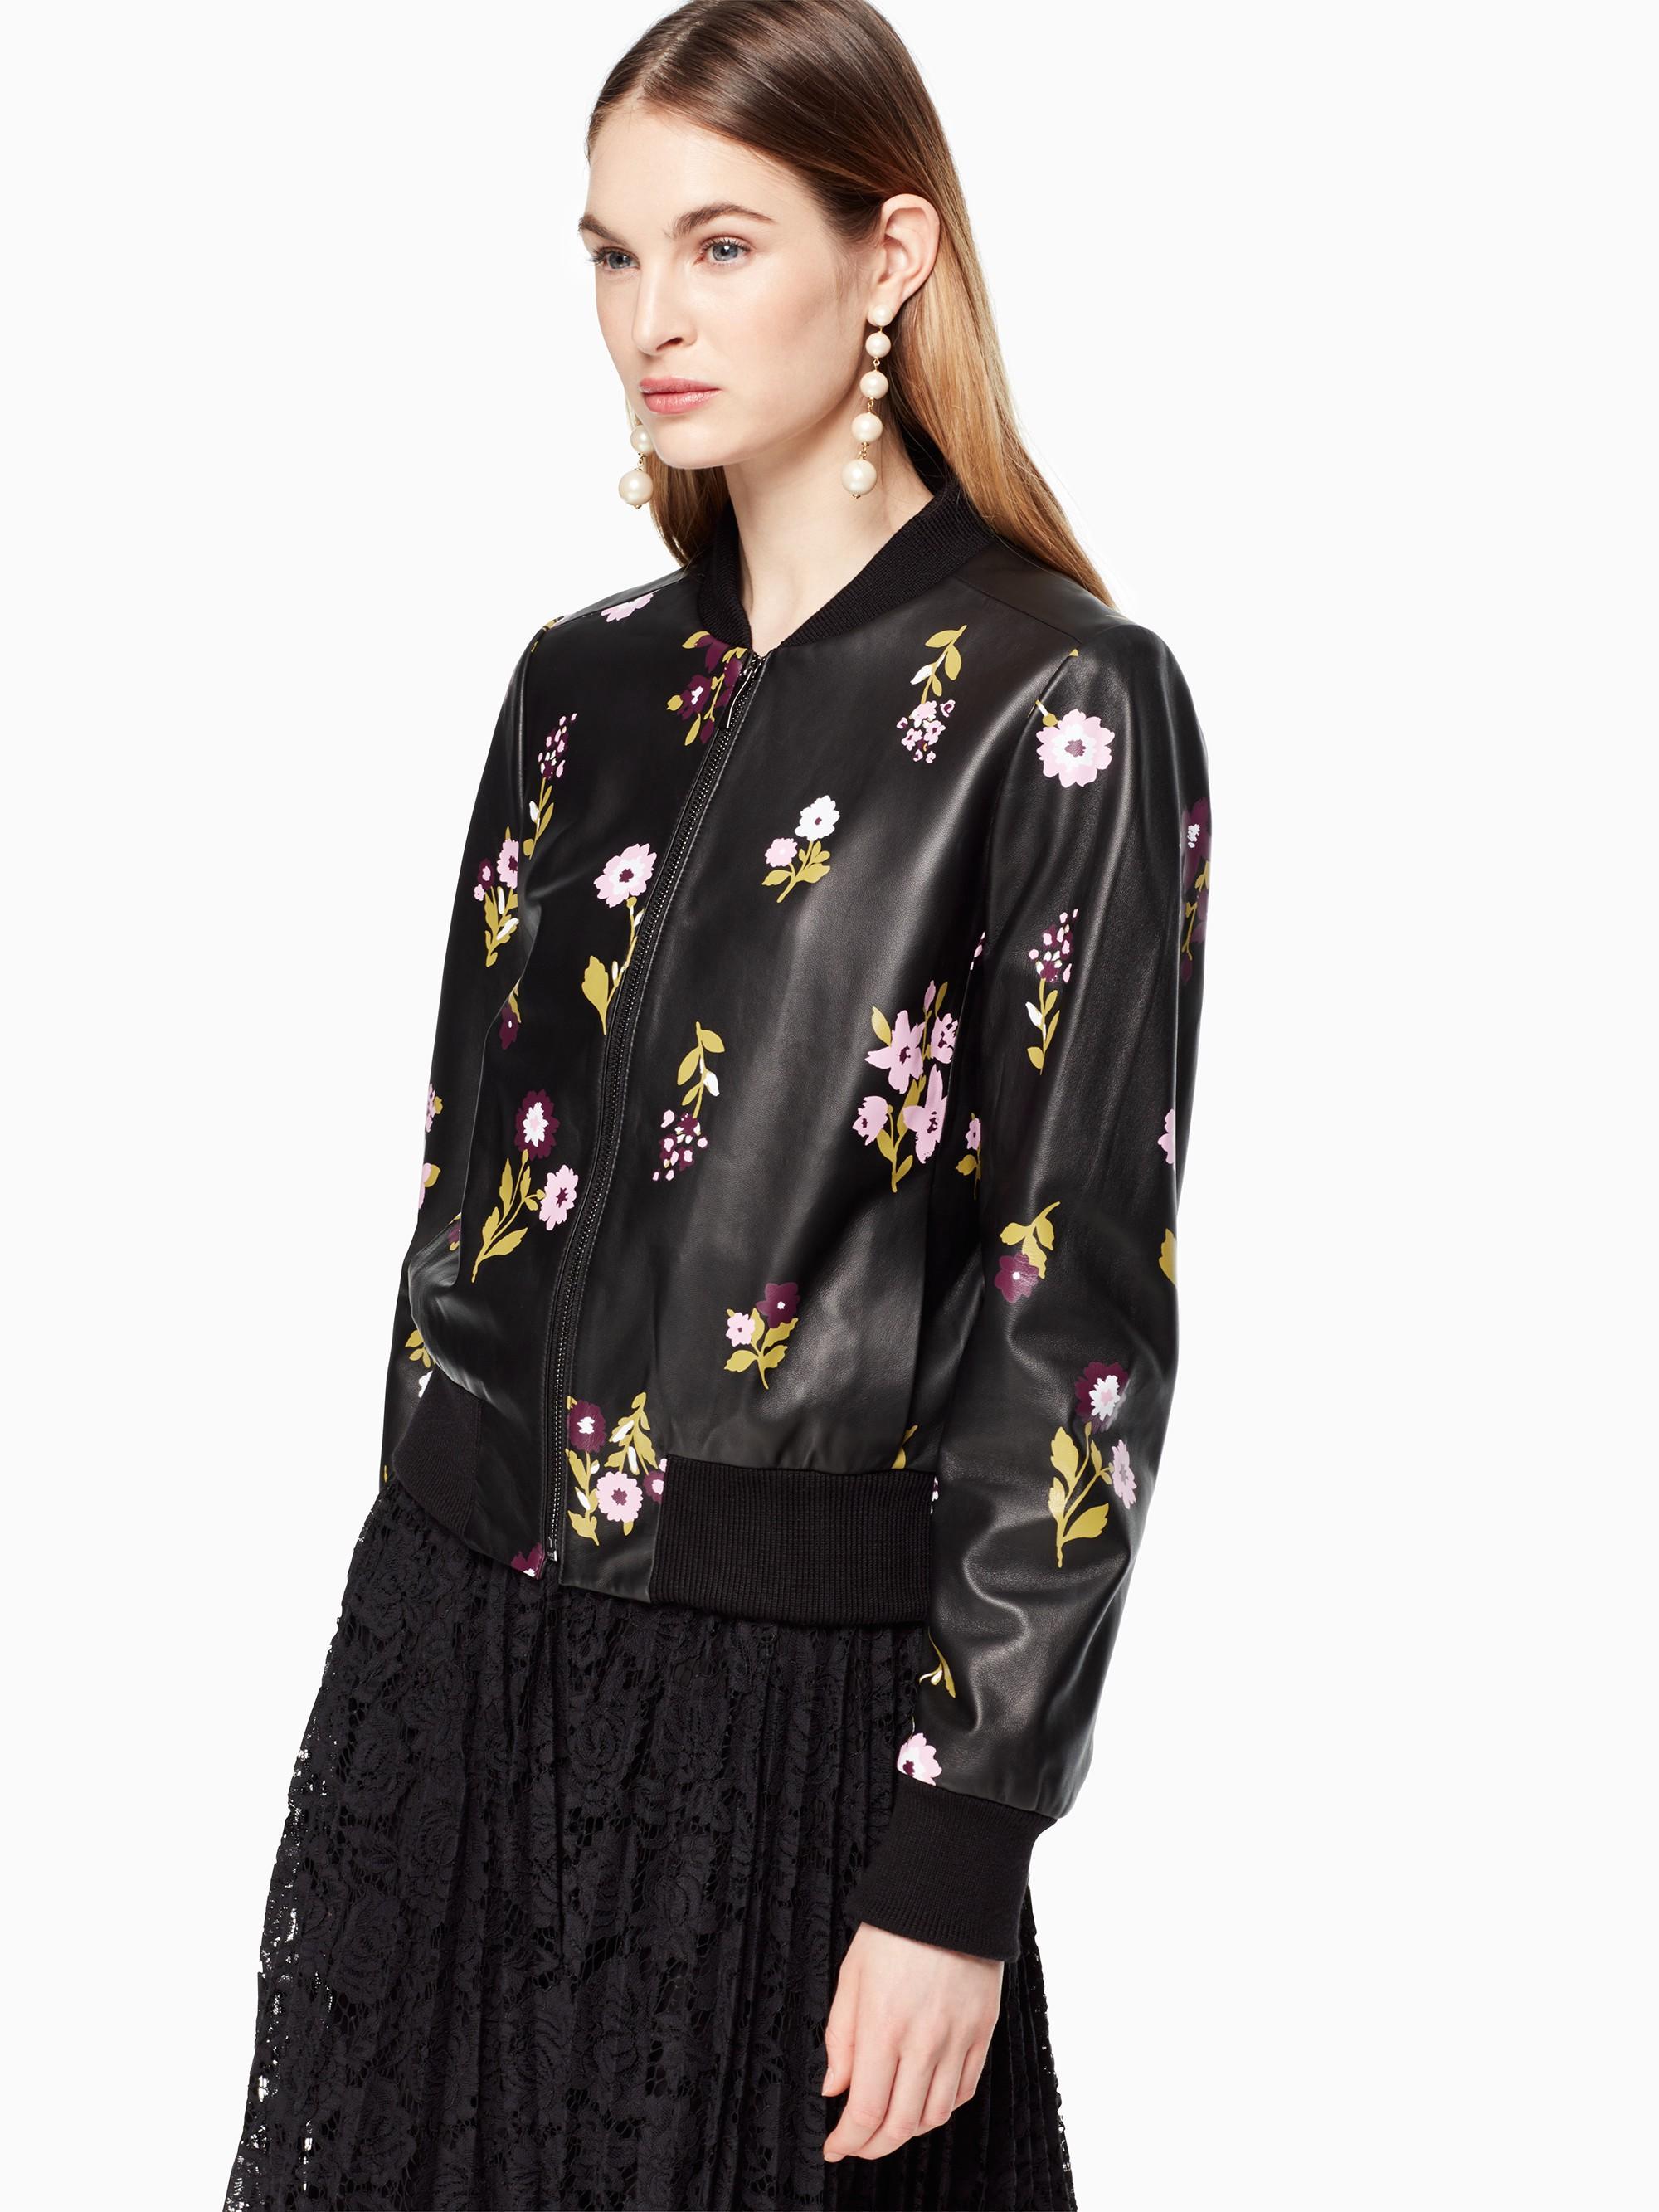 Kate Spade In Bloom Leather Bomber Jacket In Black